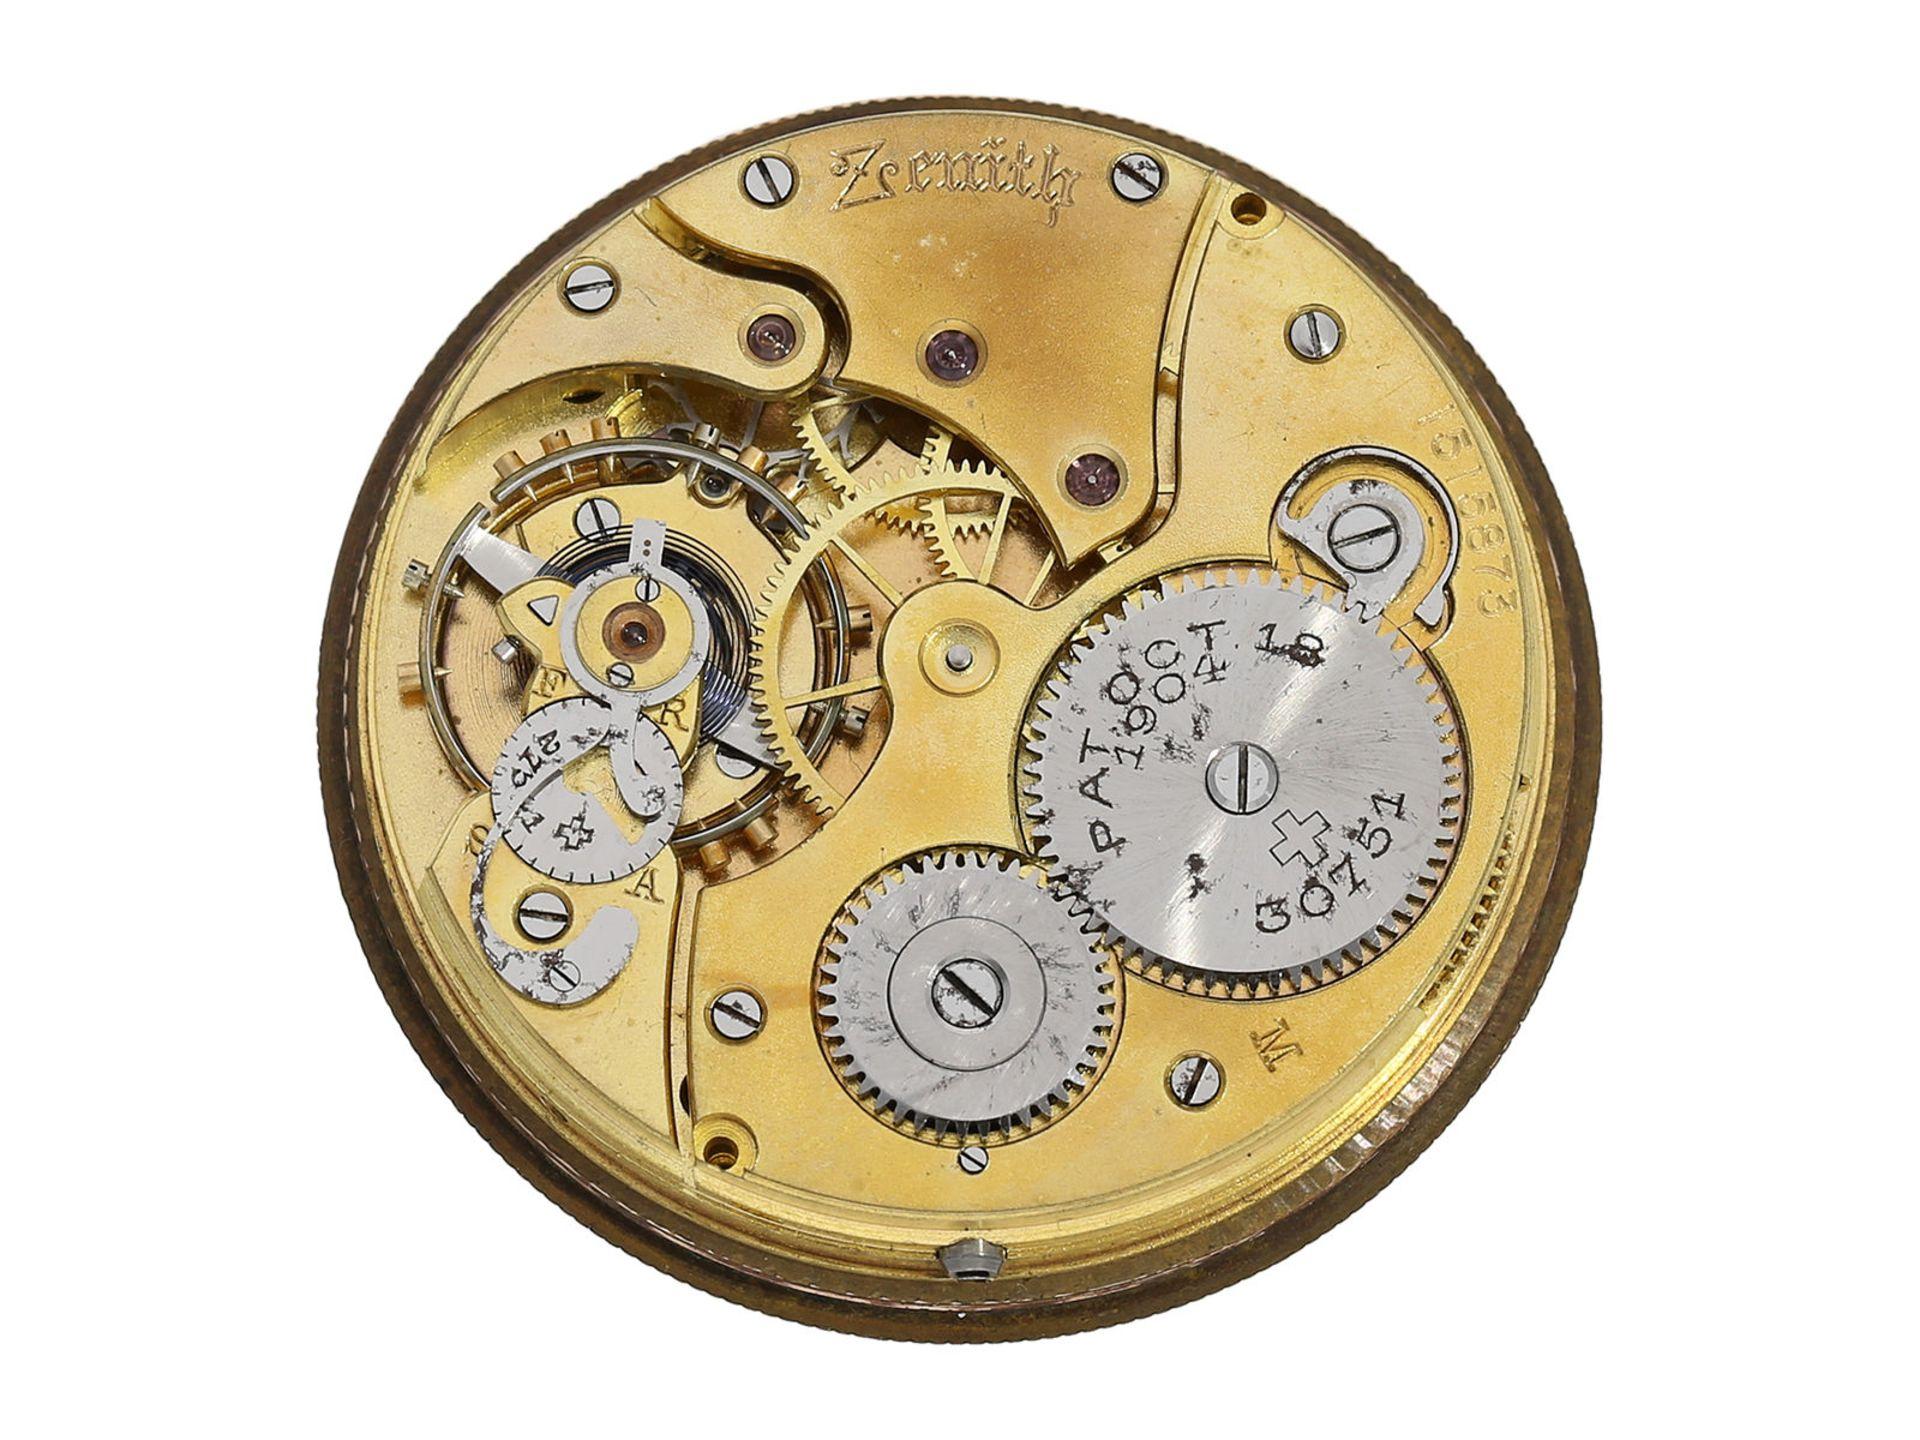 Pocket watch: chronometer Zenith in rare, perfectly preserved onyx case, ca. 1920 - Bild 5 aus 5